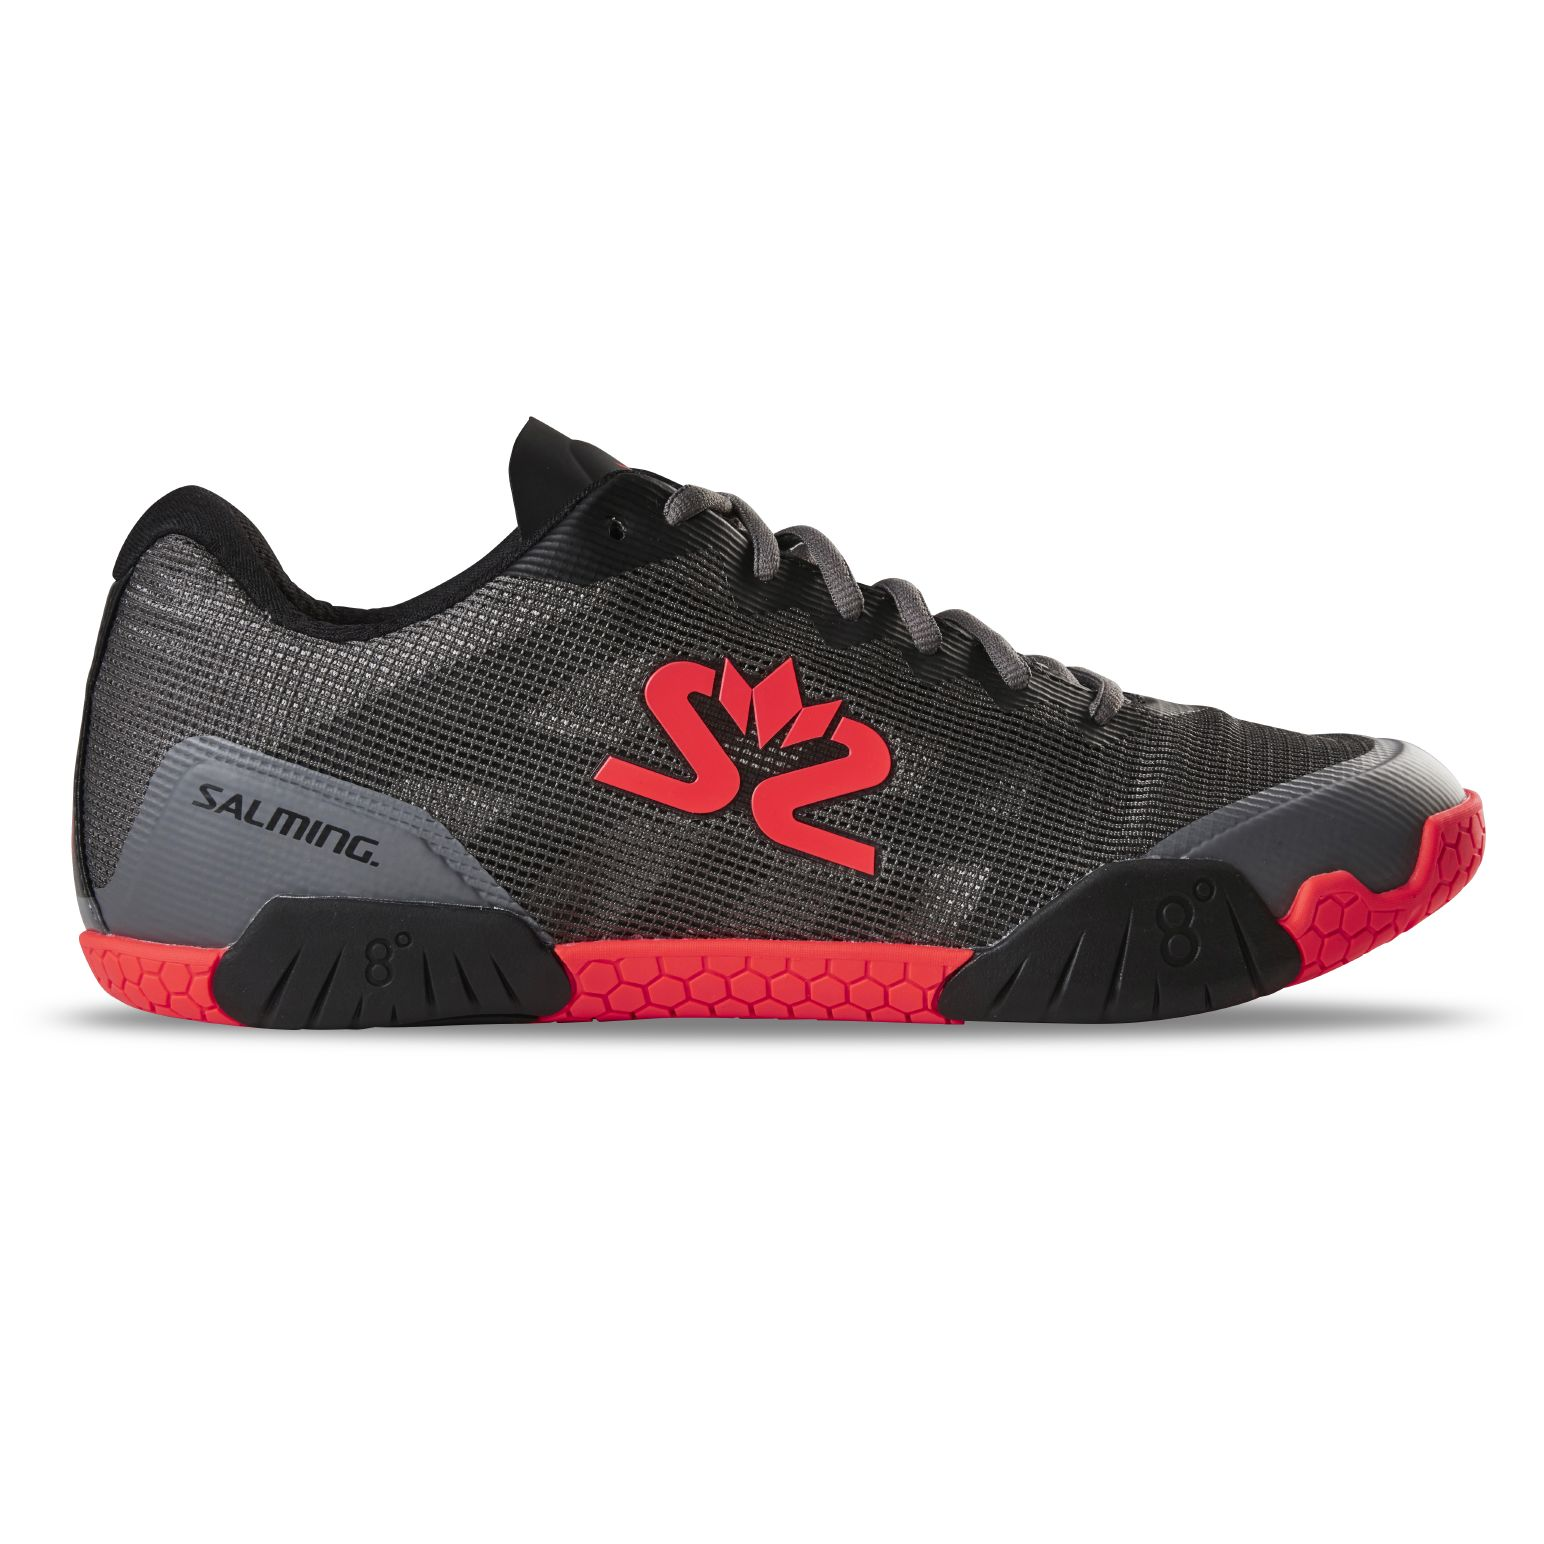 Salming Hawk Shoe Men GunMetal/Red 11 UK - 46 2/3 EUR - 30 cm